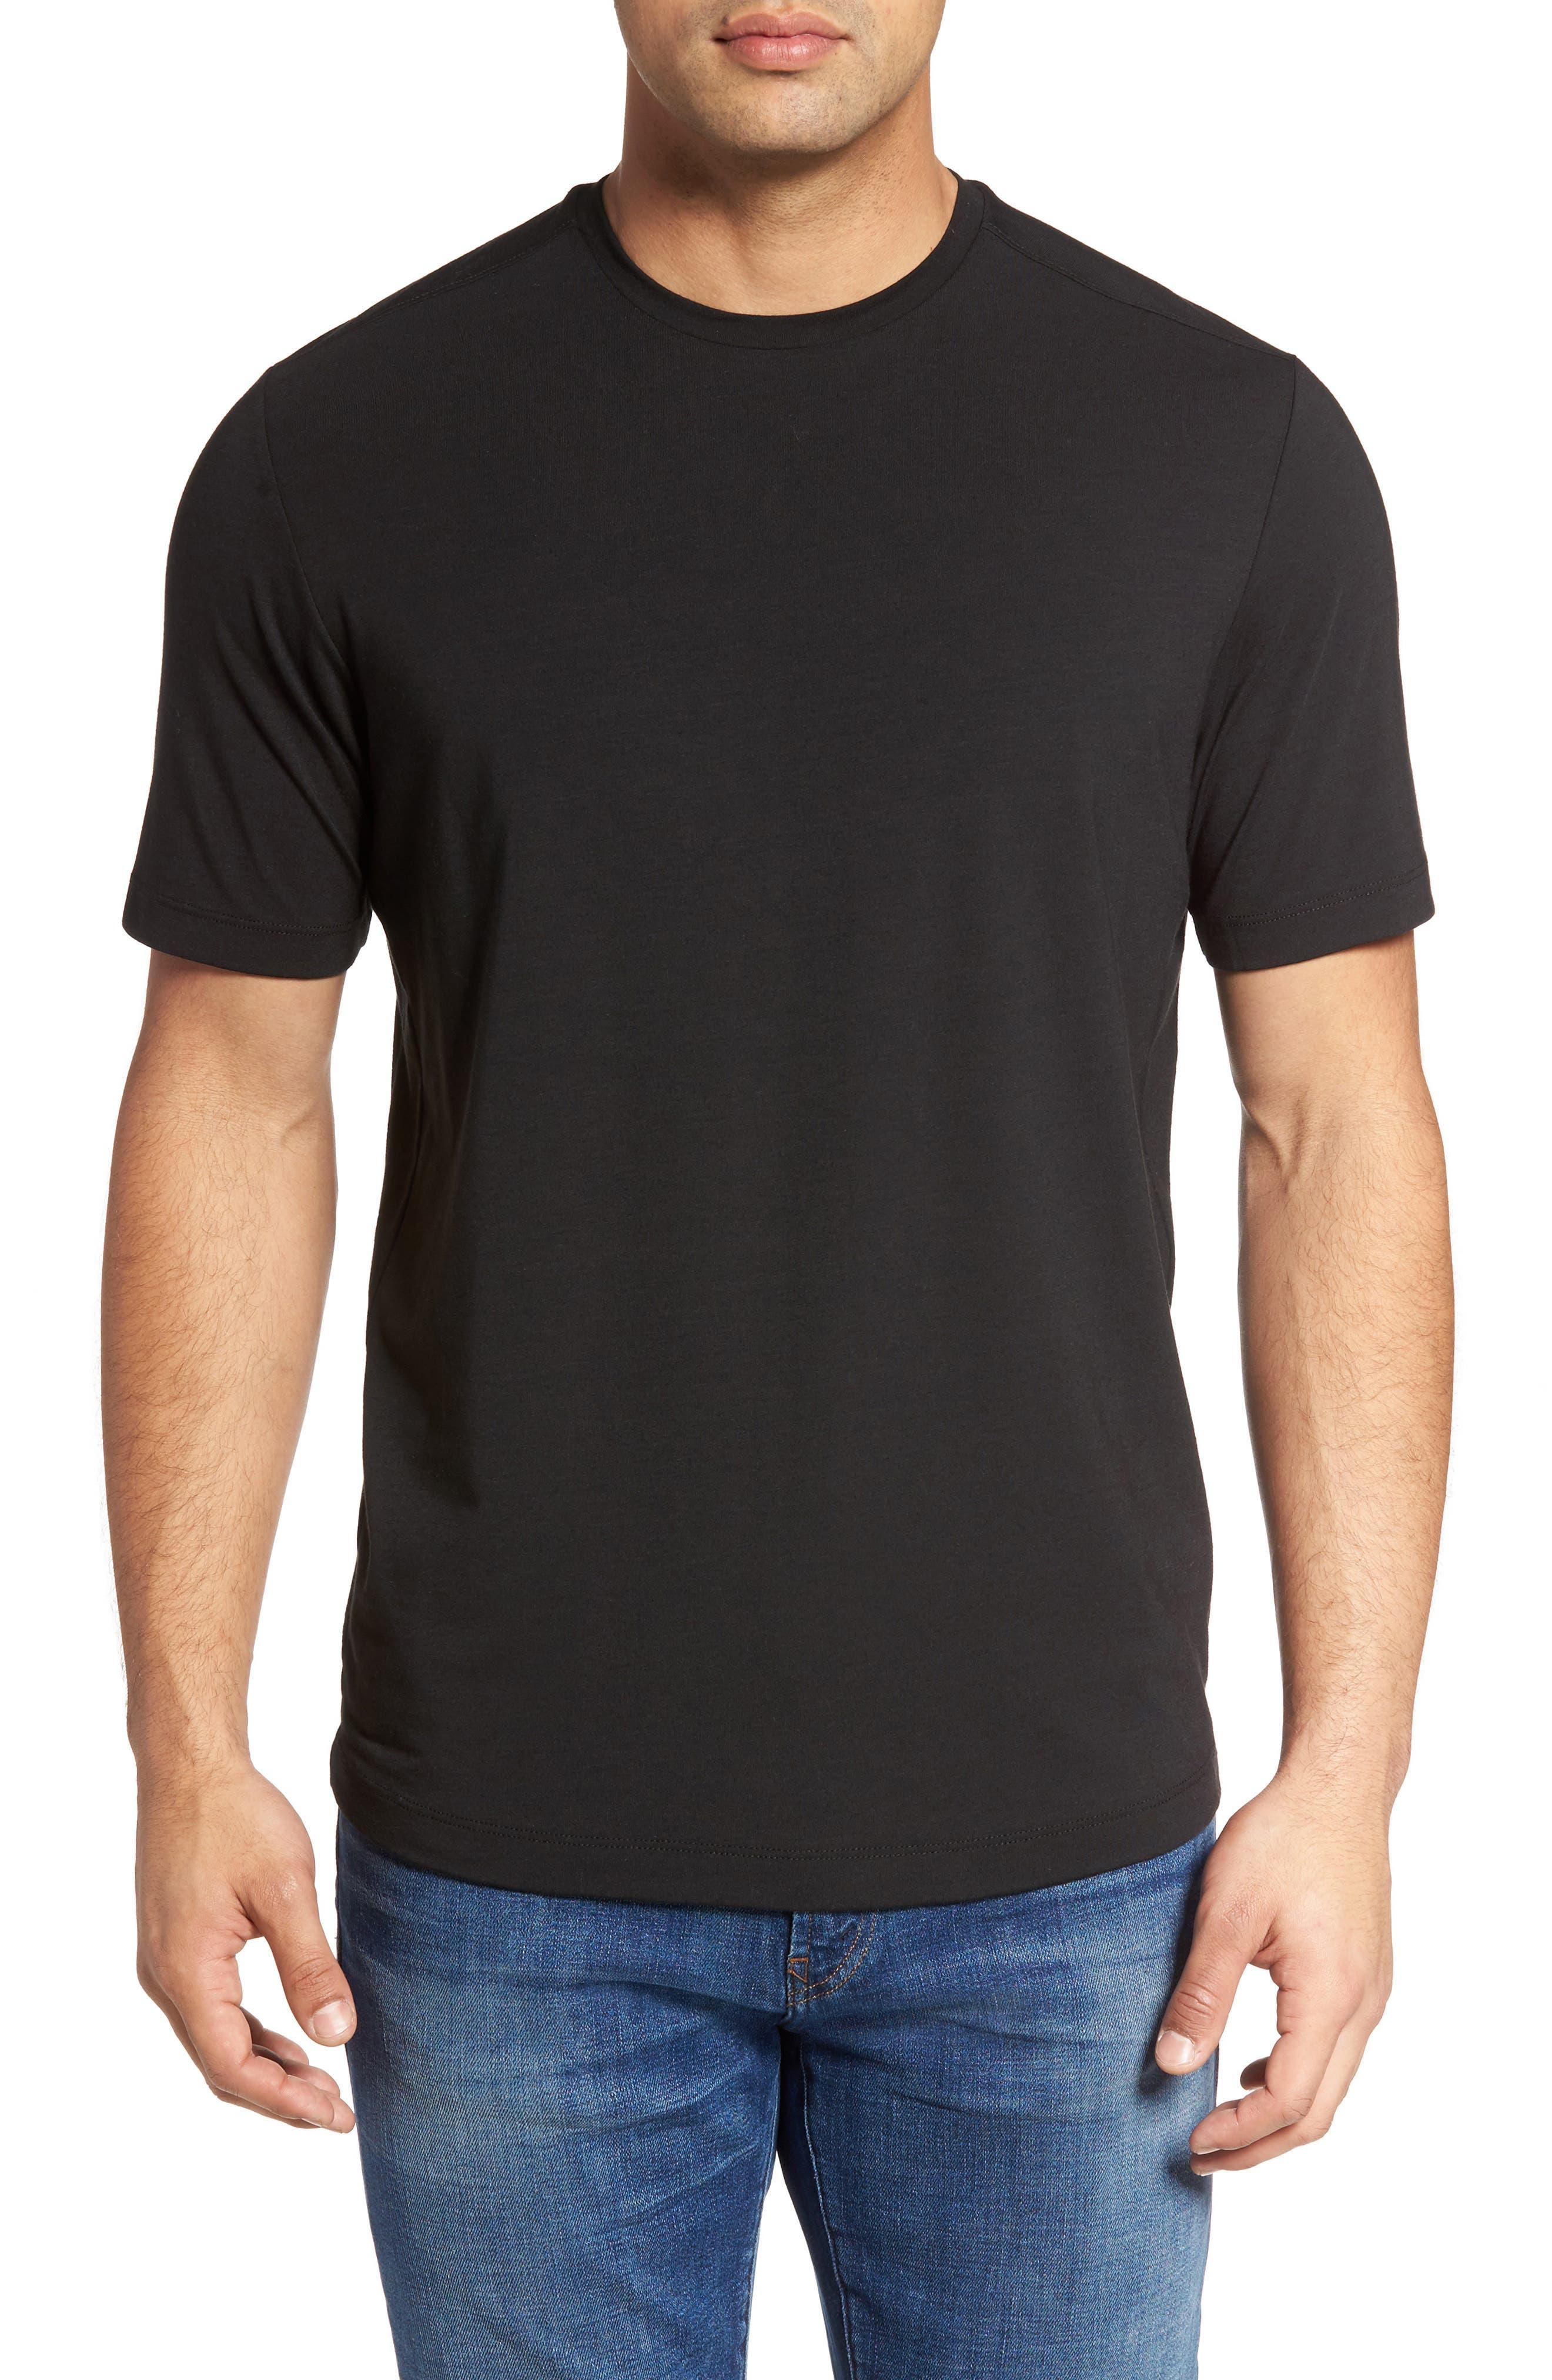 Tropicool T-Shirt,                             Main thumbnail 1, color,                             Black